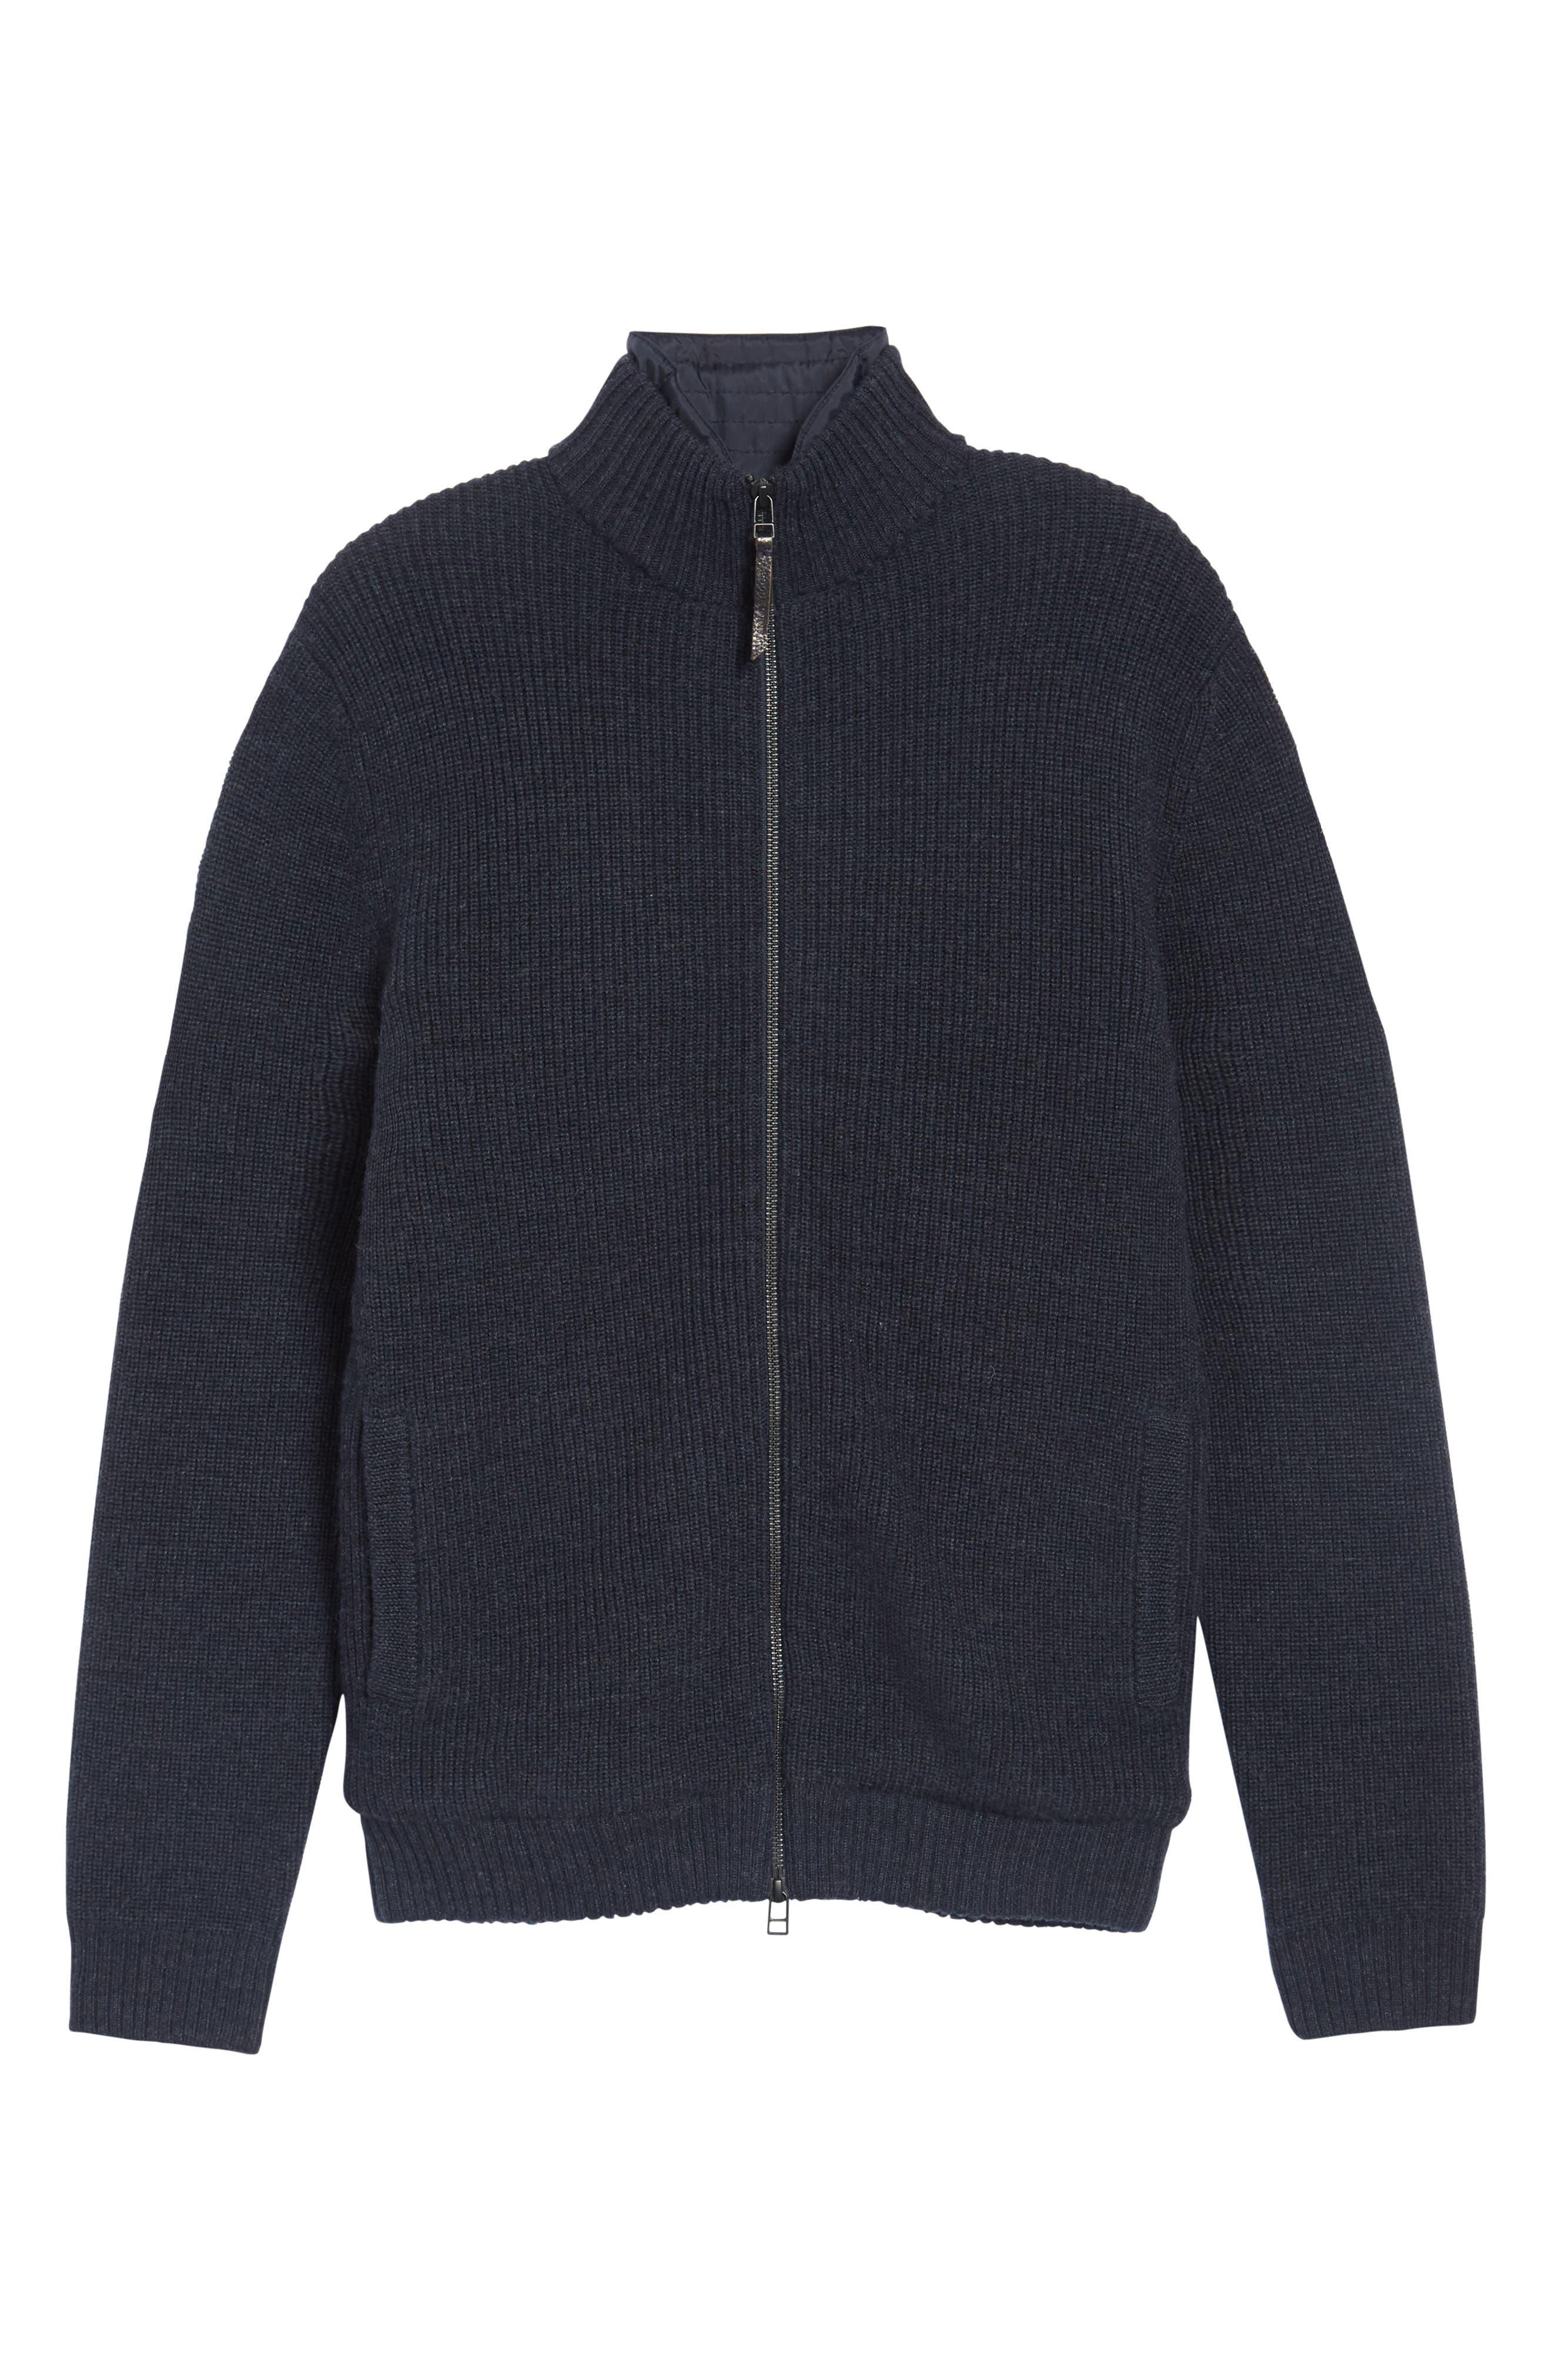 RODD & GUNN, Camerons Track Zip Wool Sweater, Alternate thumbnail 6, color, 412